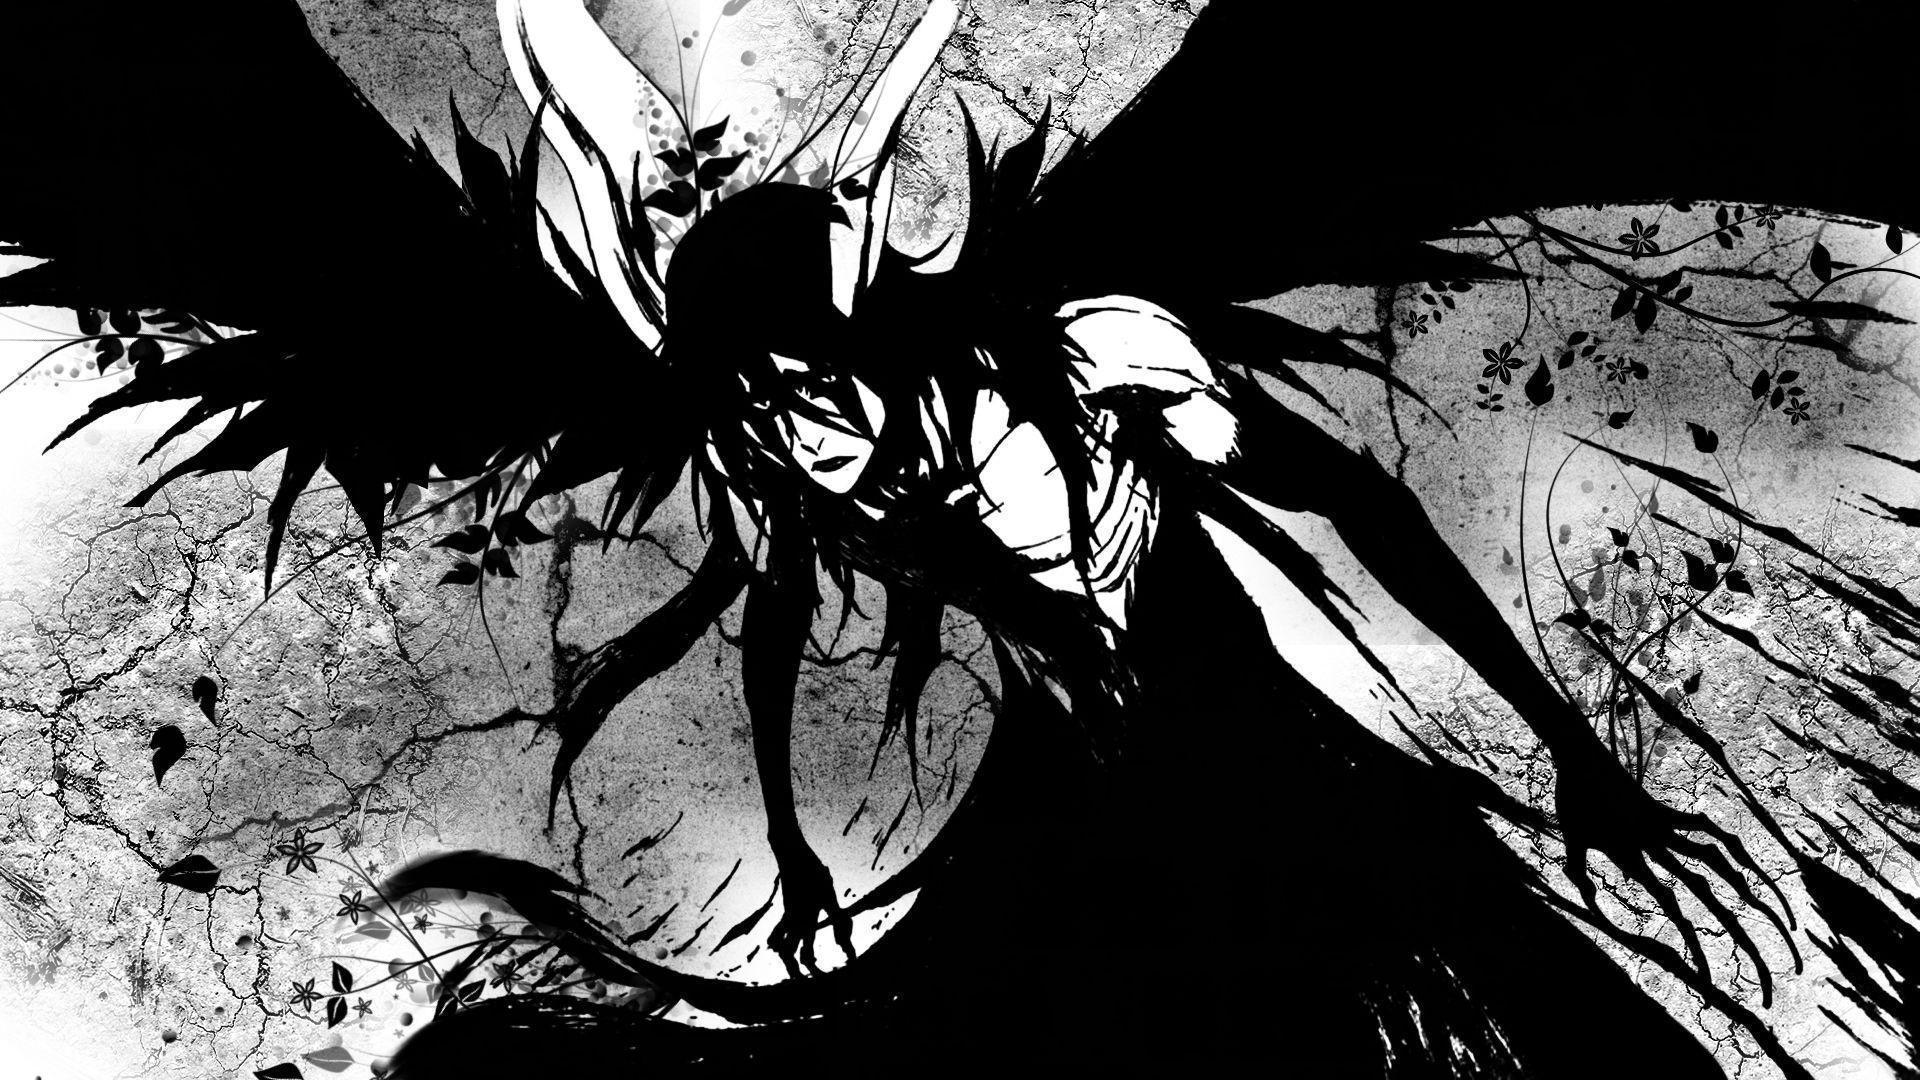 Download Bleach Espada Manga Ulquiorra Wallpaper 1920x1080